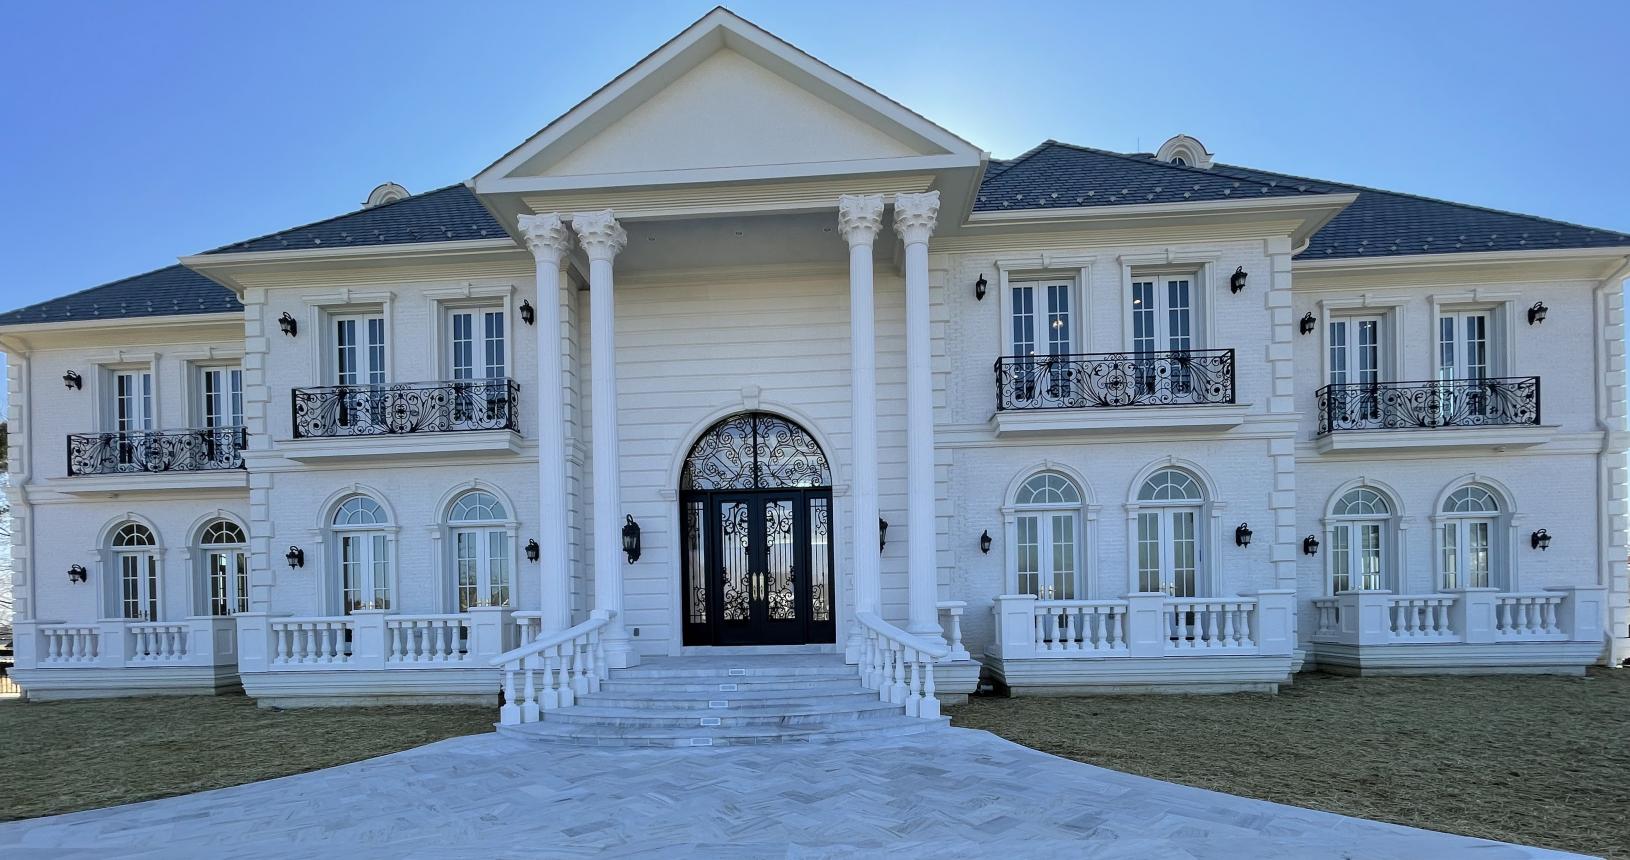 Estate Entrance with white pillars